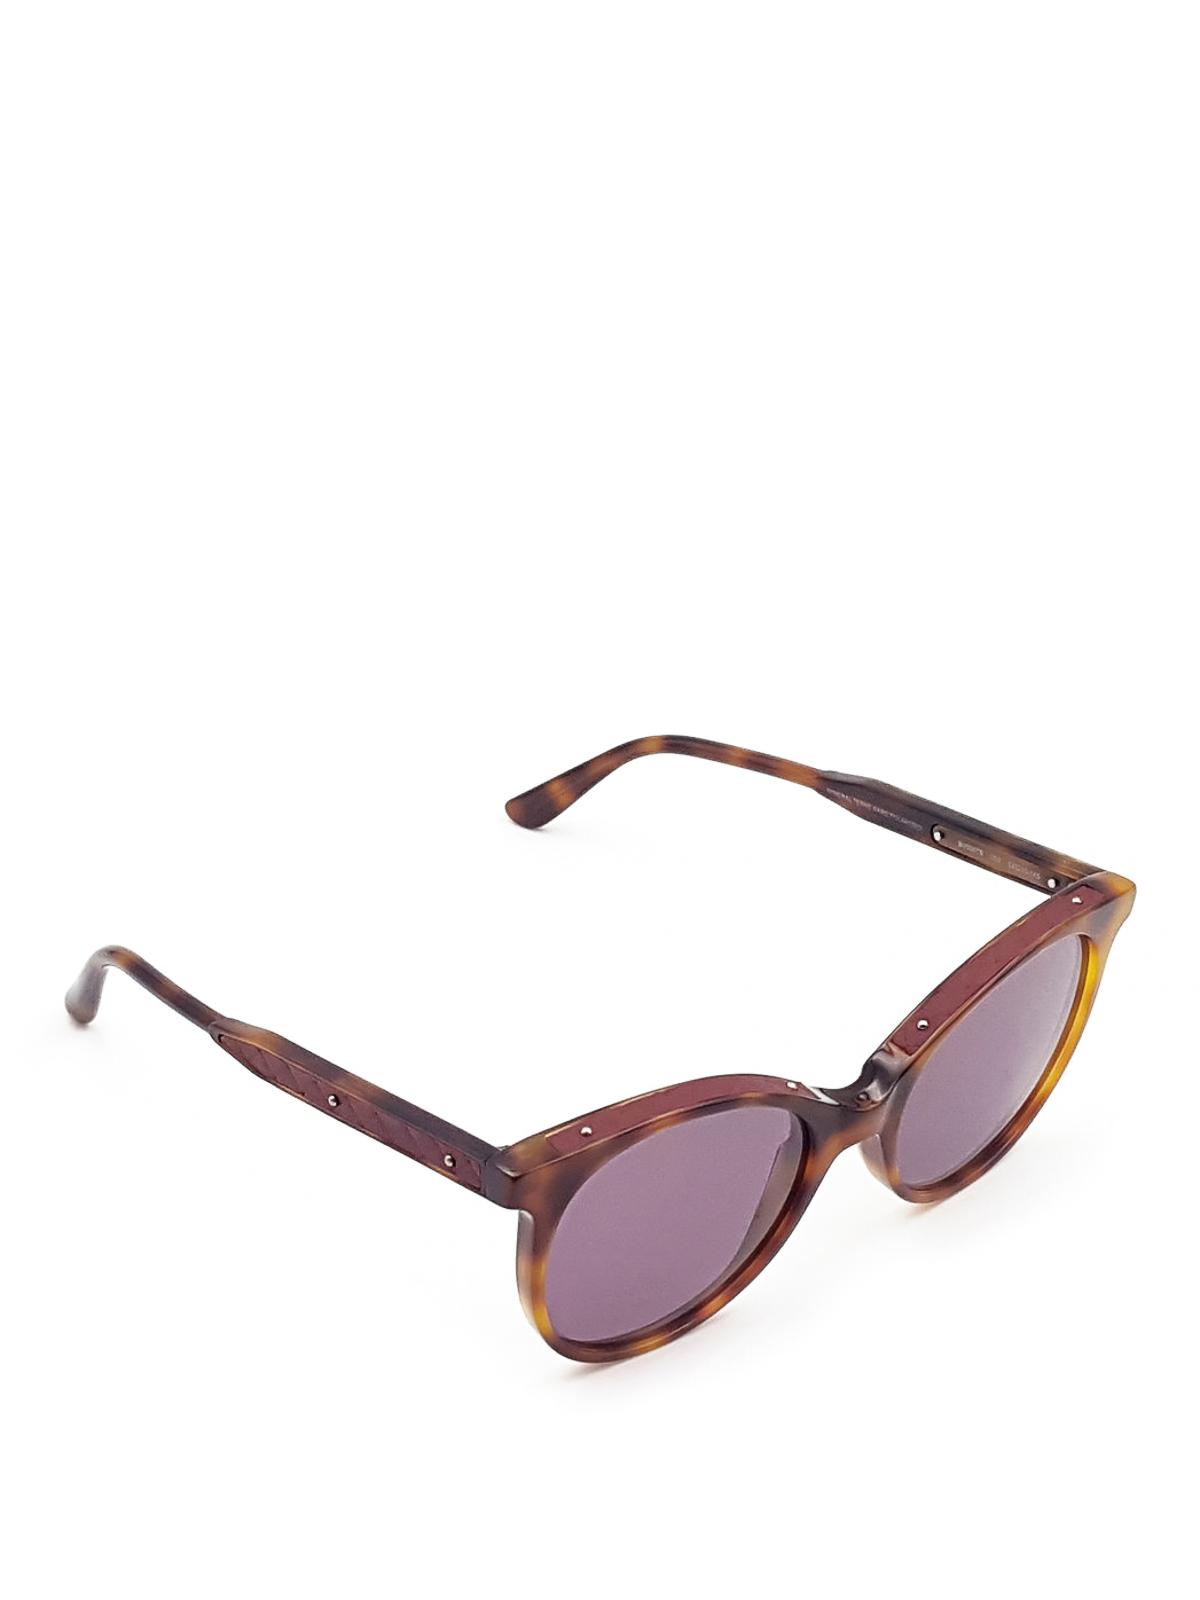 2d0a6be908dc Bottega Veneta Sunglasses Case